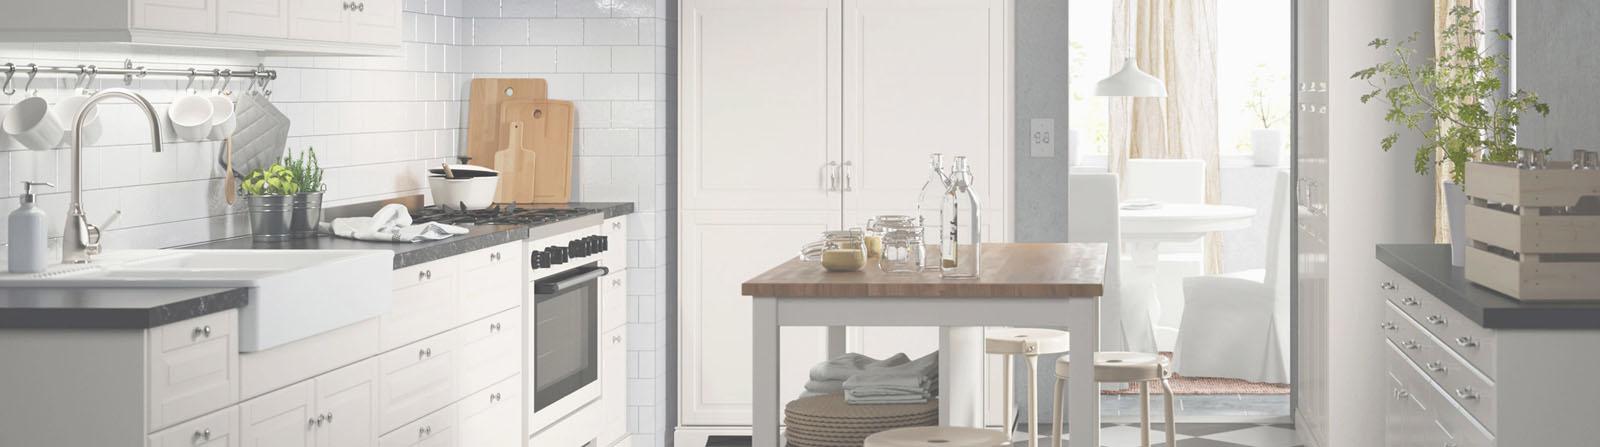 kitchen and bathroom remodel dover de h h builders renovations rh h hbuildersinc com